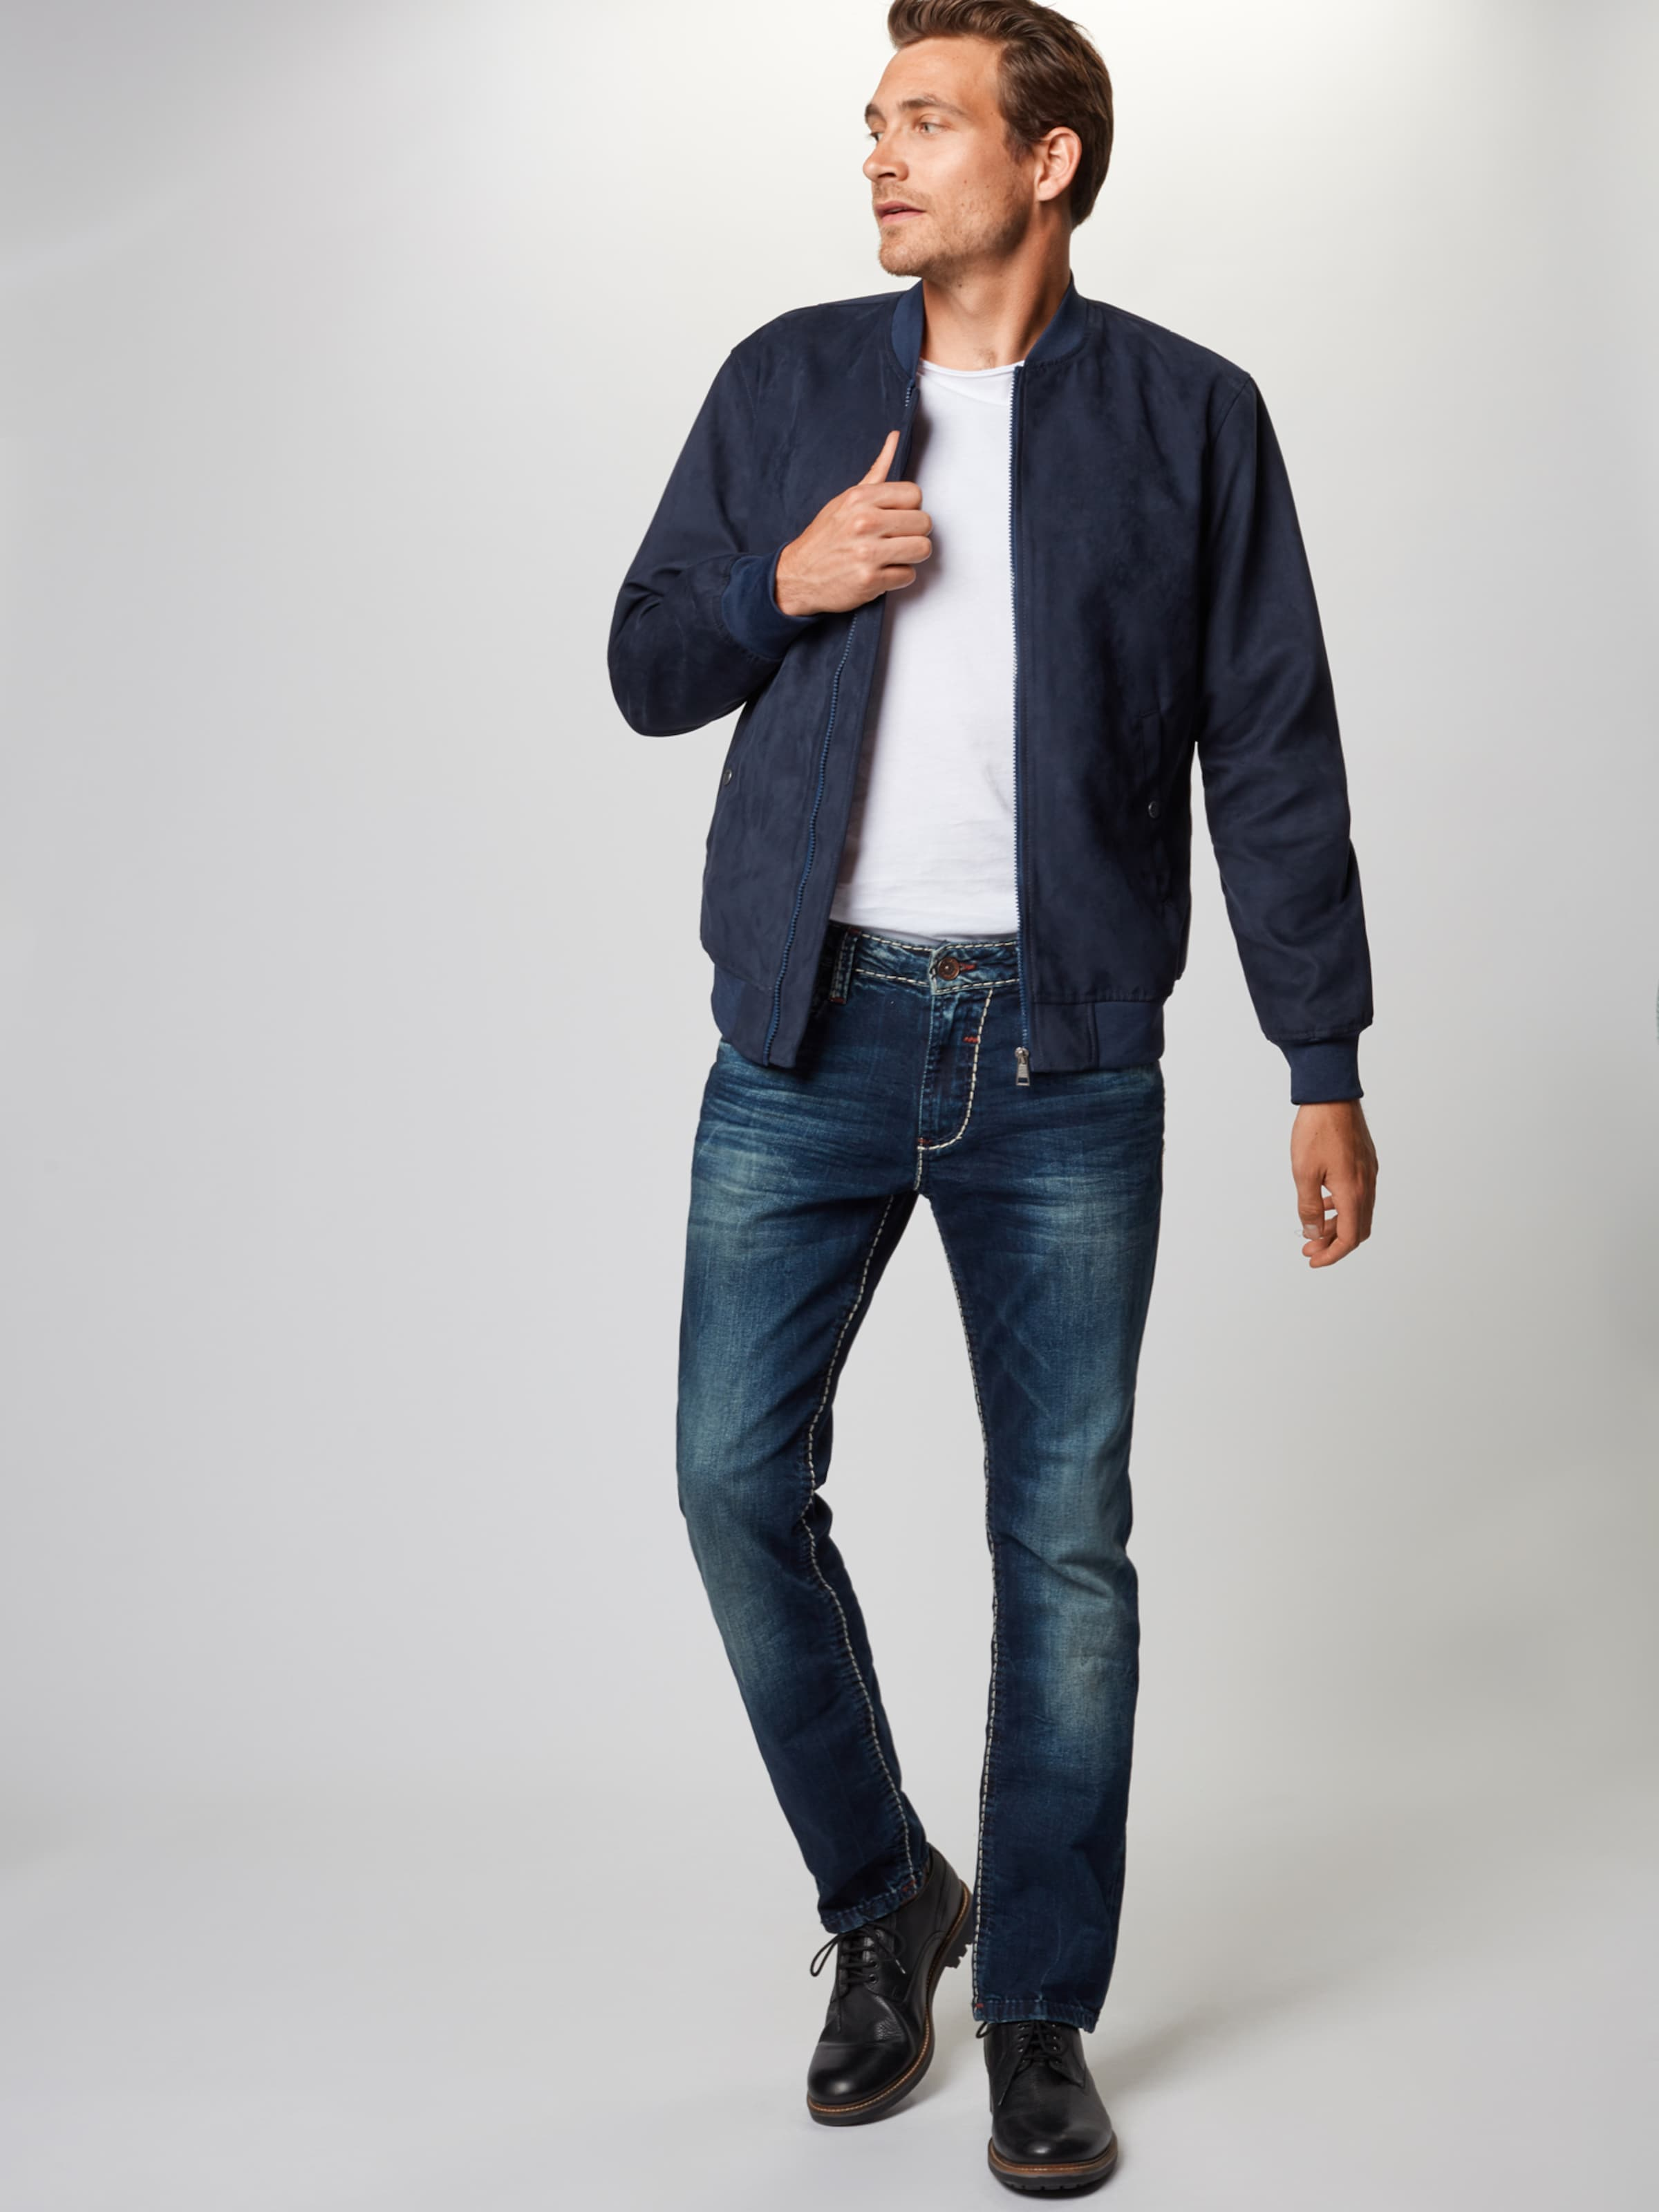 Jeans r611' 'ni In David co Dunkelblau Camp FKJcl1